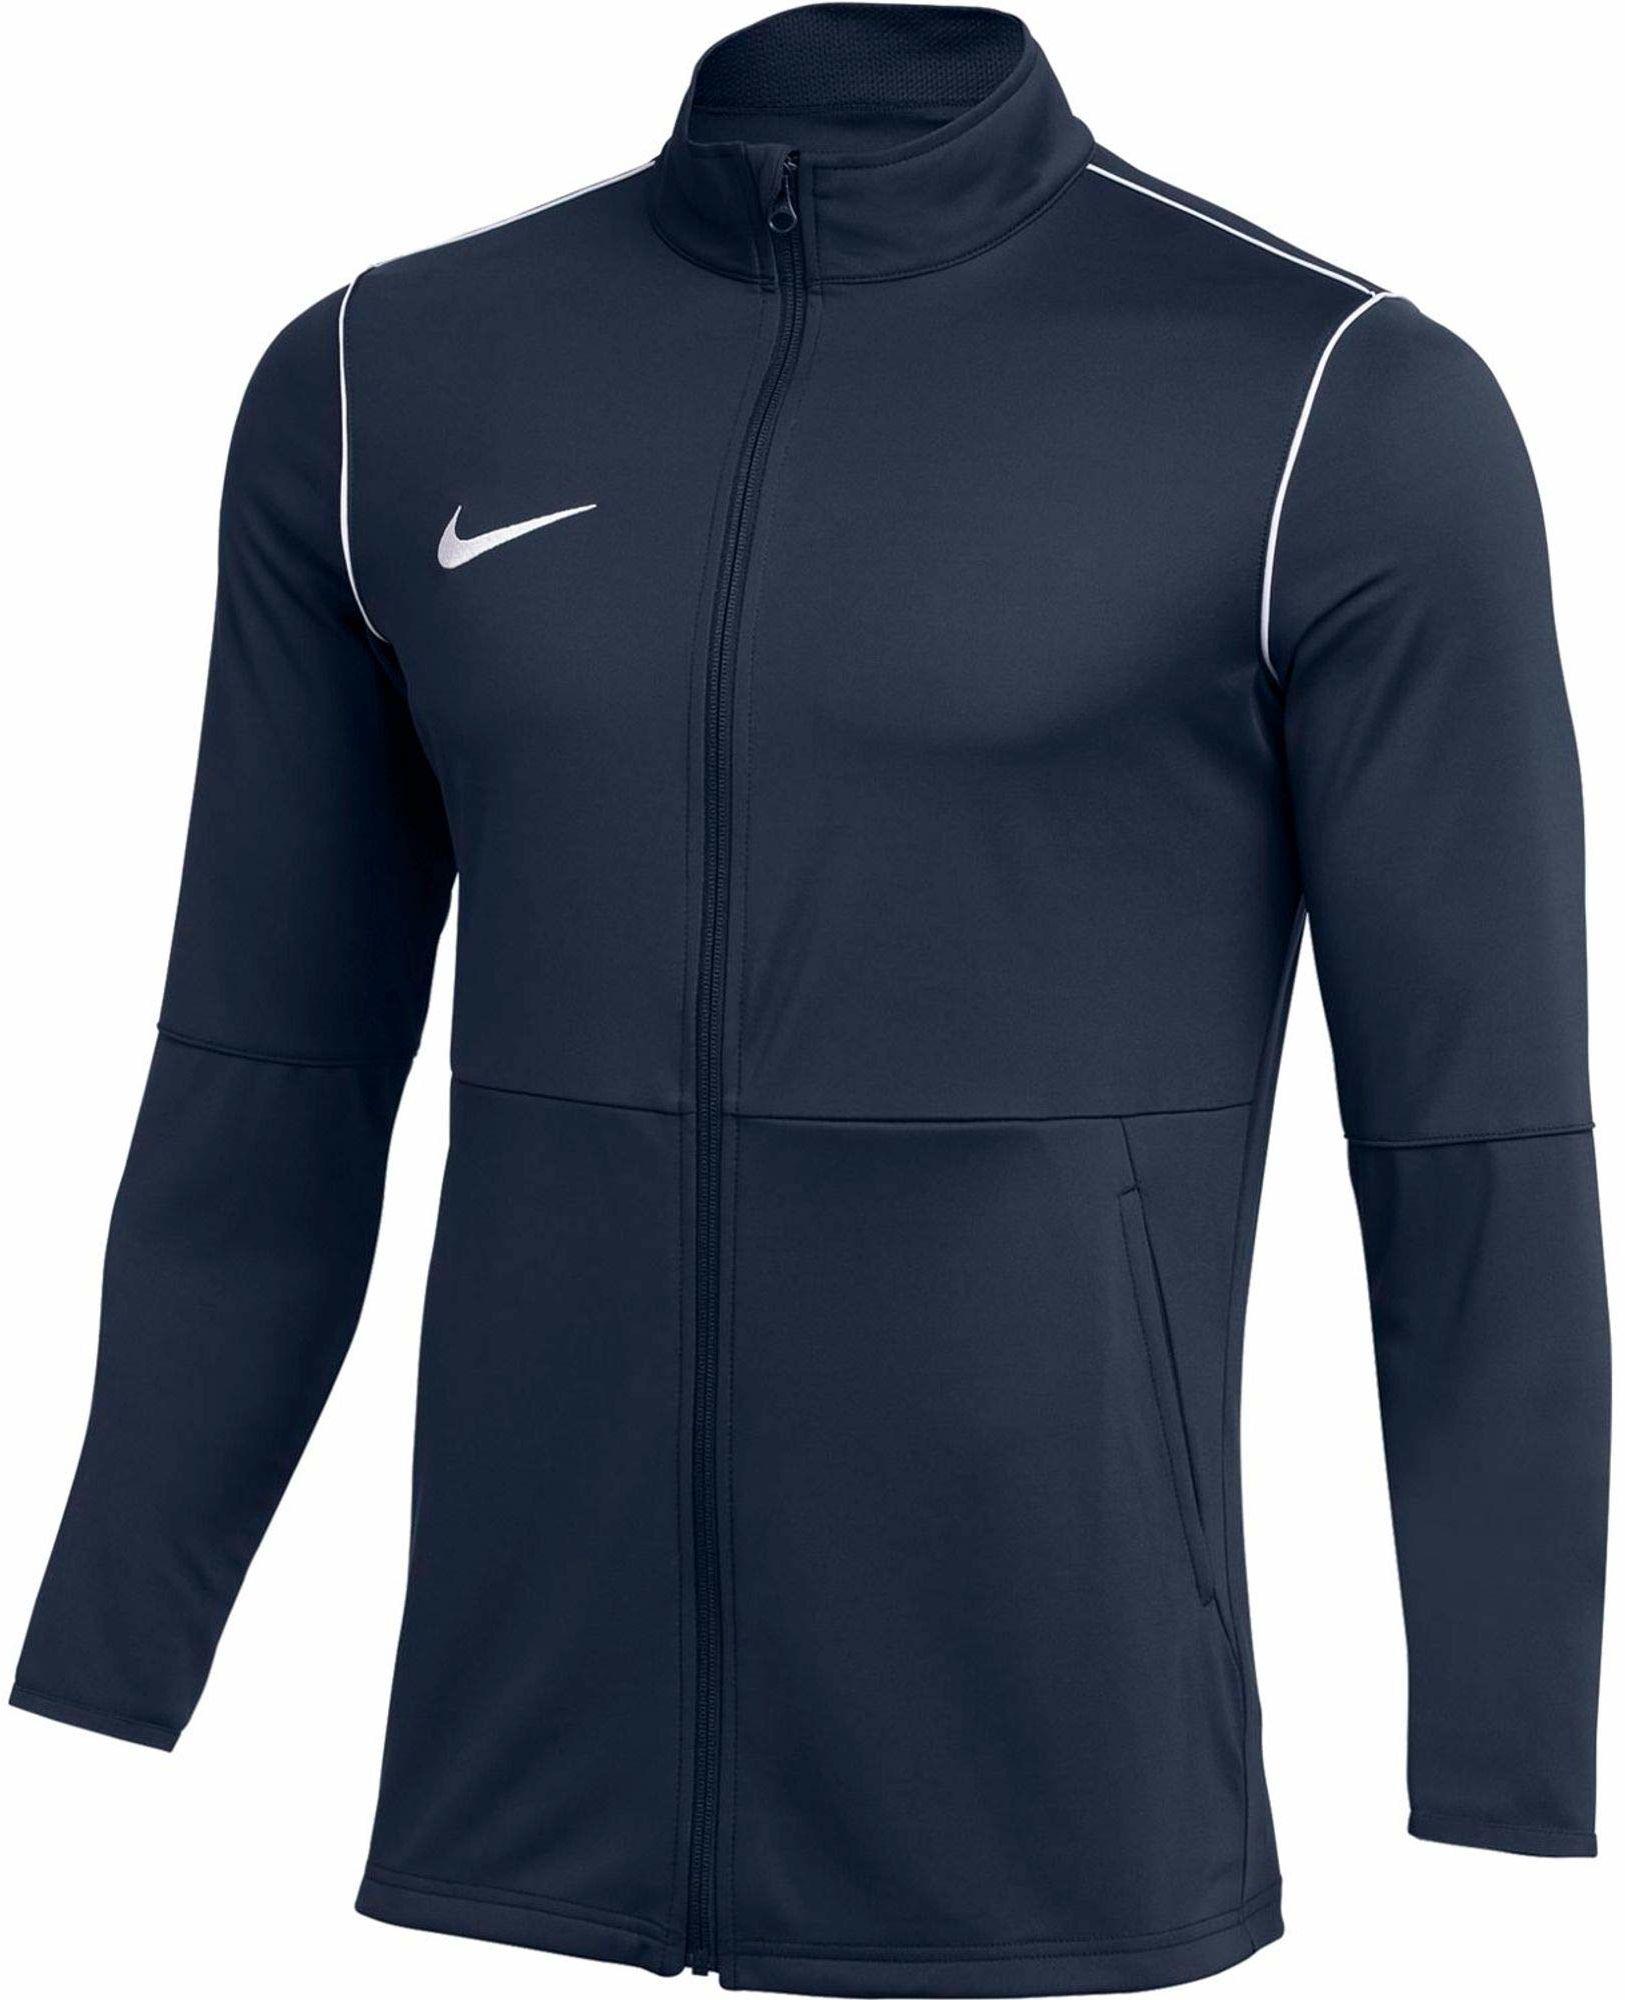 Nike męska kurtka sportowa M NK DRY PARK20 TRK JKT K, obsydian/biała/biała, 2XL